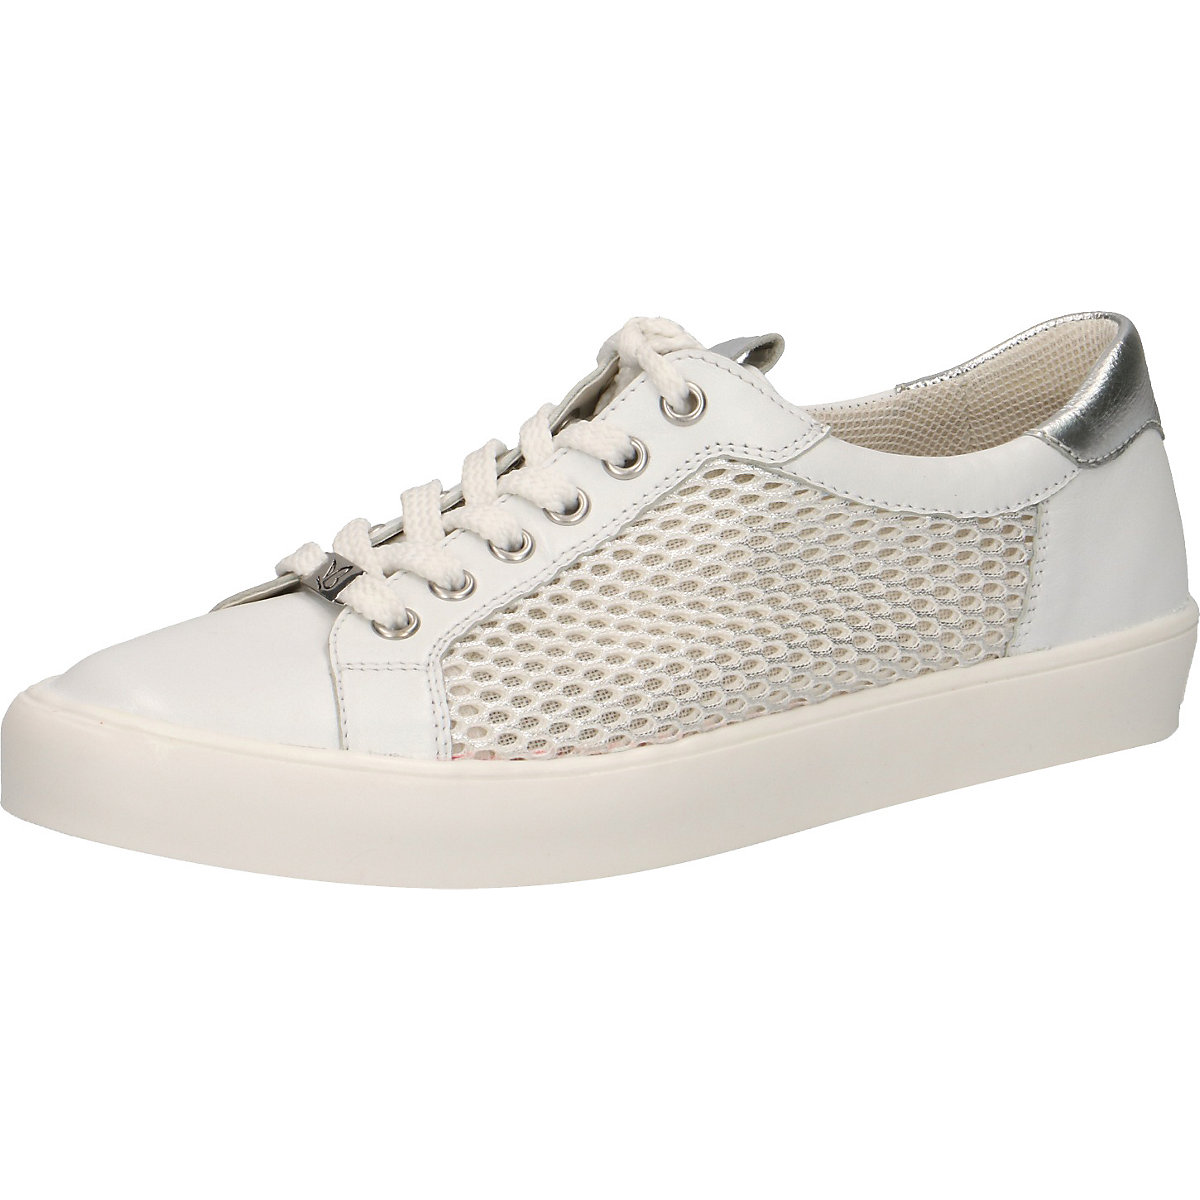 CAPRICE, Turnschuhe Low, weiß  Gute Qualität beliebte Schuhe